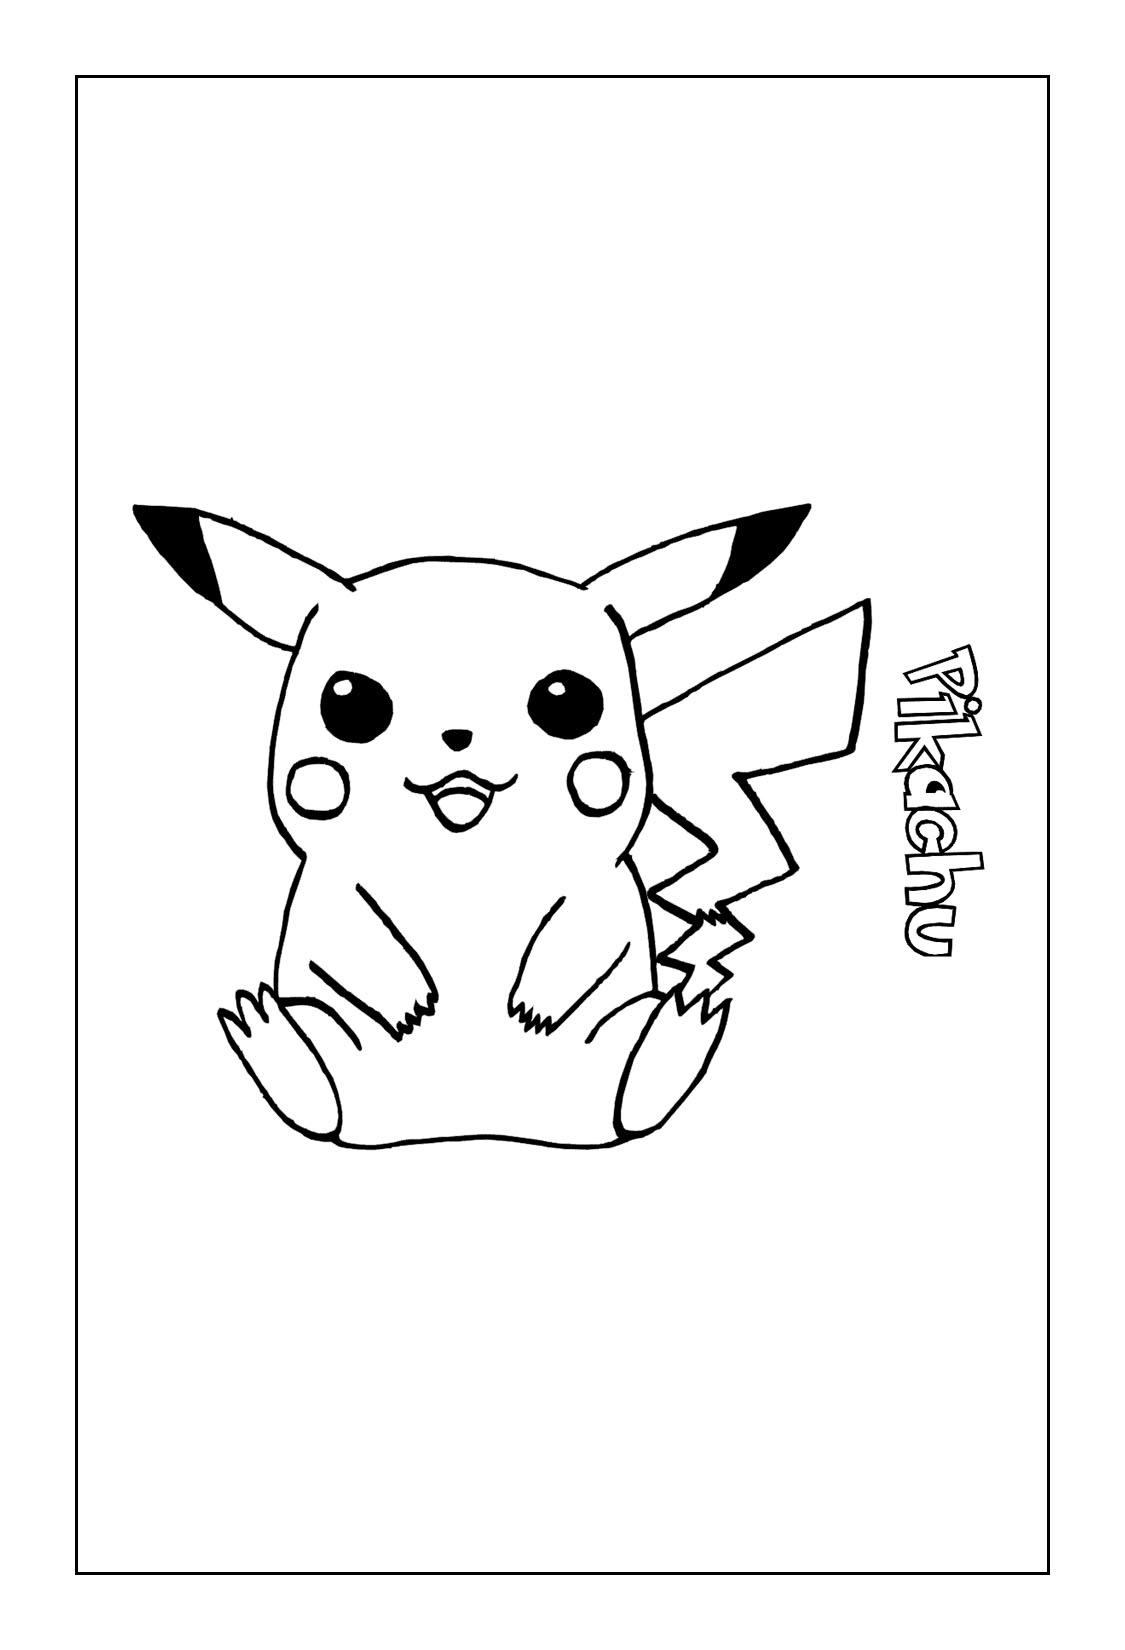 Pikachu Coloring Page Printable